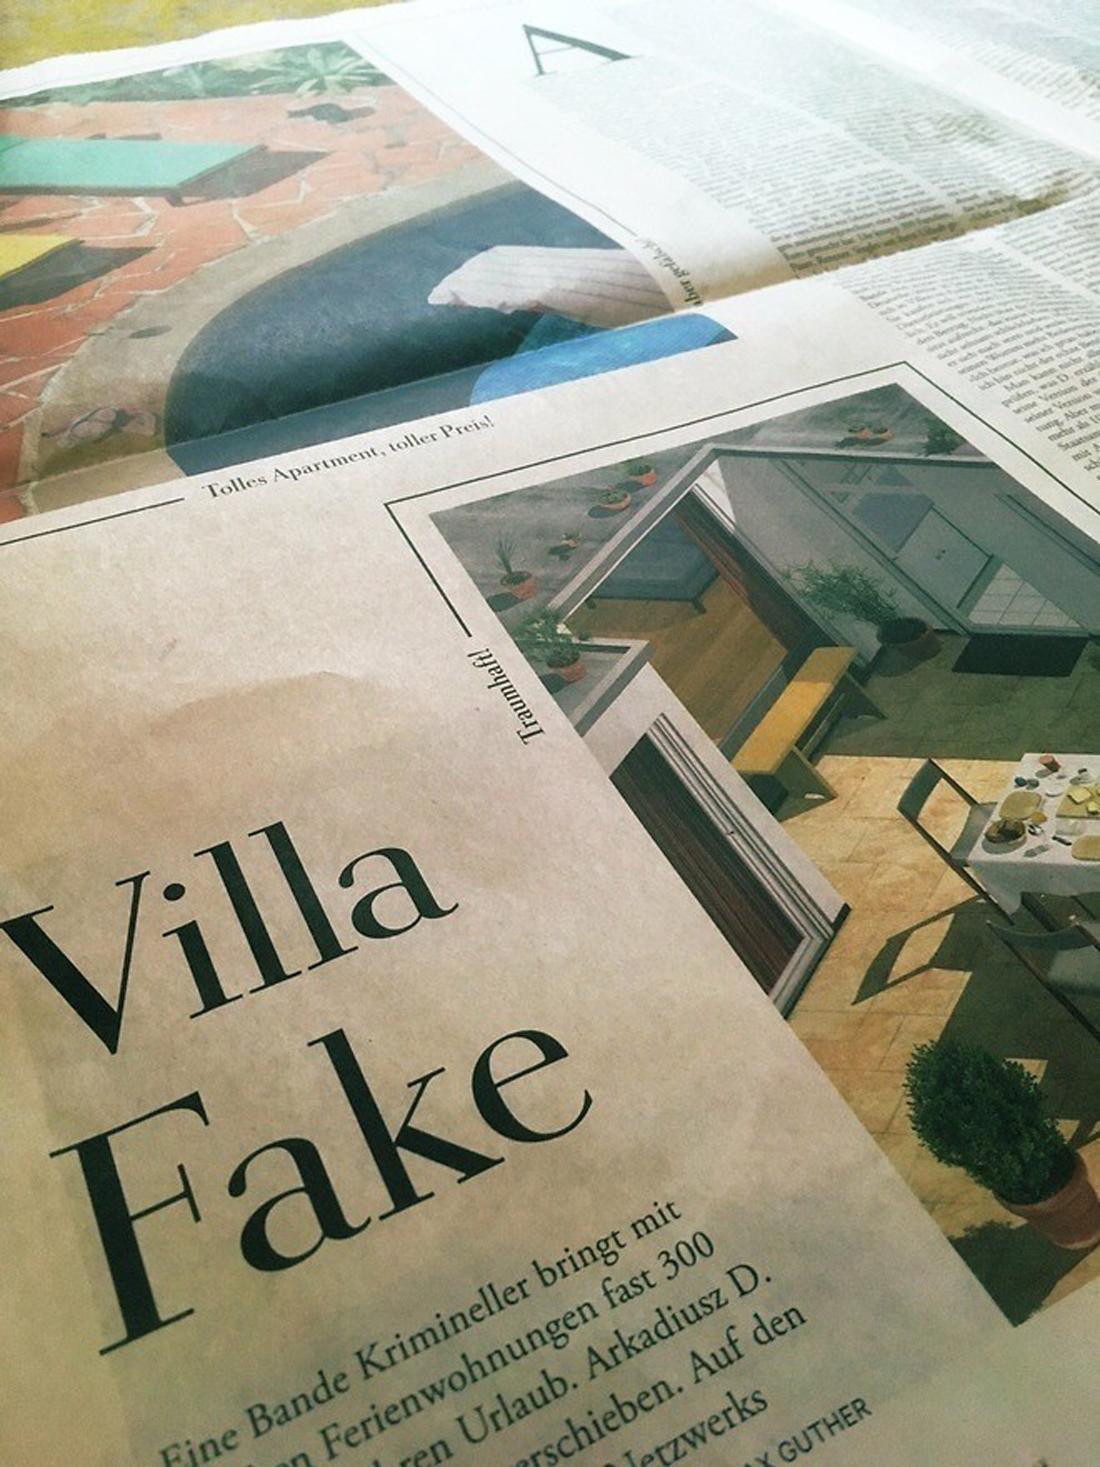 Villa Fake